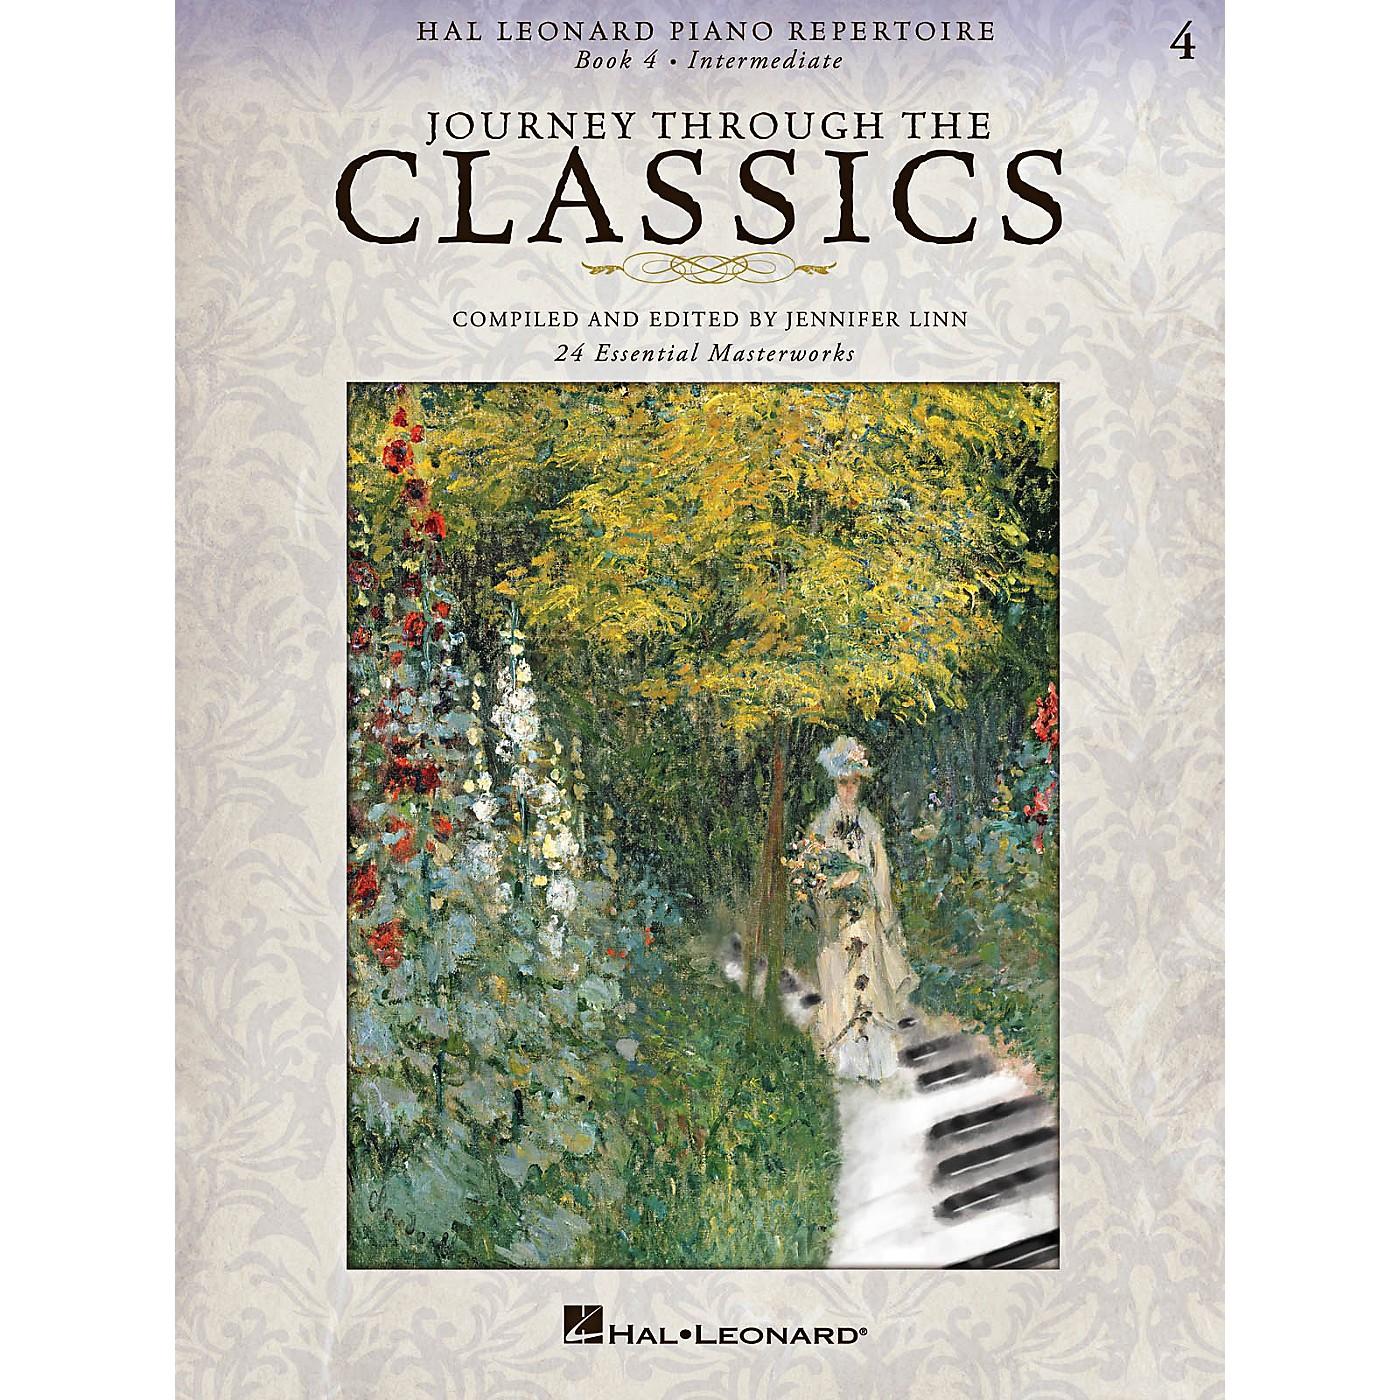 Hal Leonard Piano Repertoire Series - Journey Through The Classics Book 4 Intermediate Level thumbnail